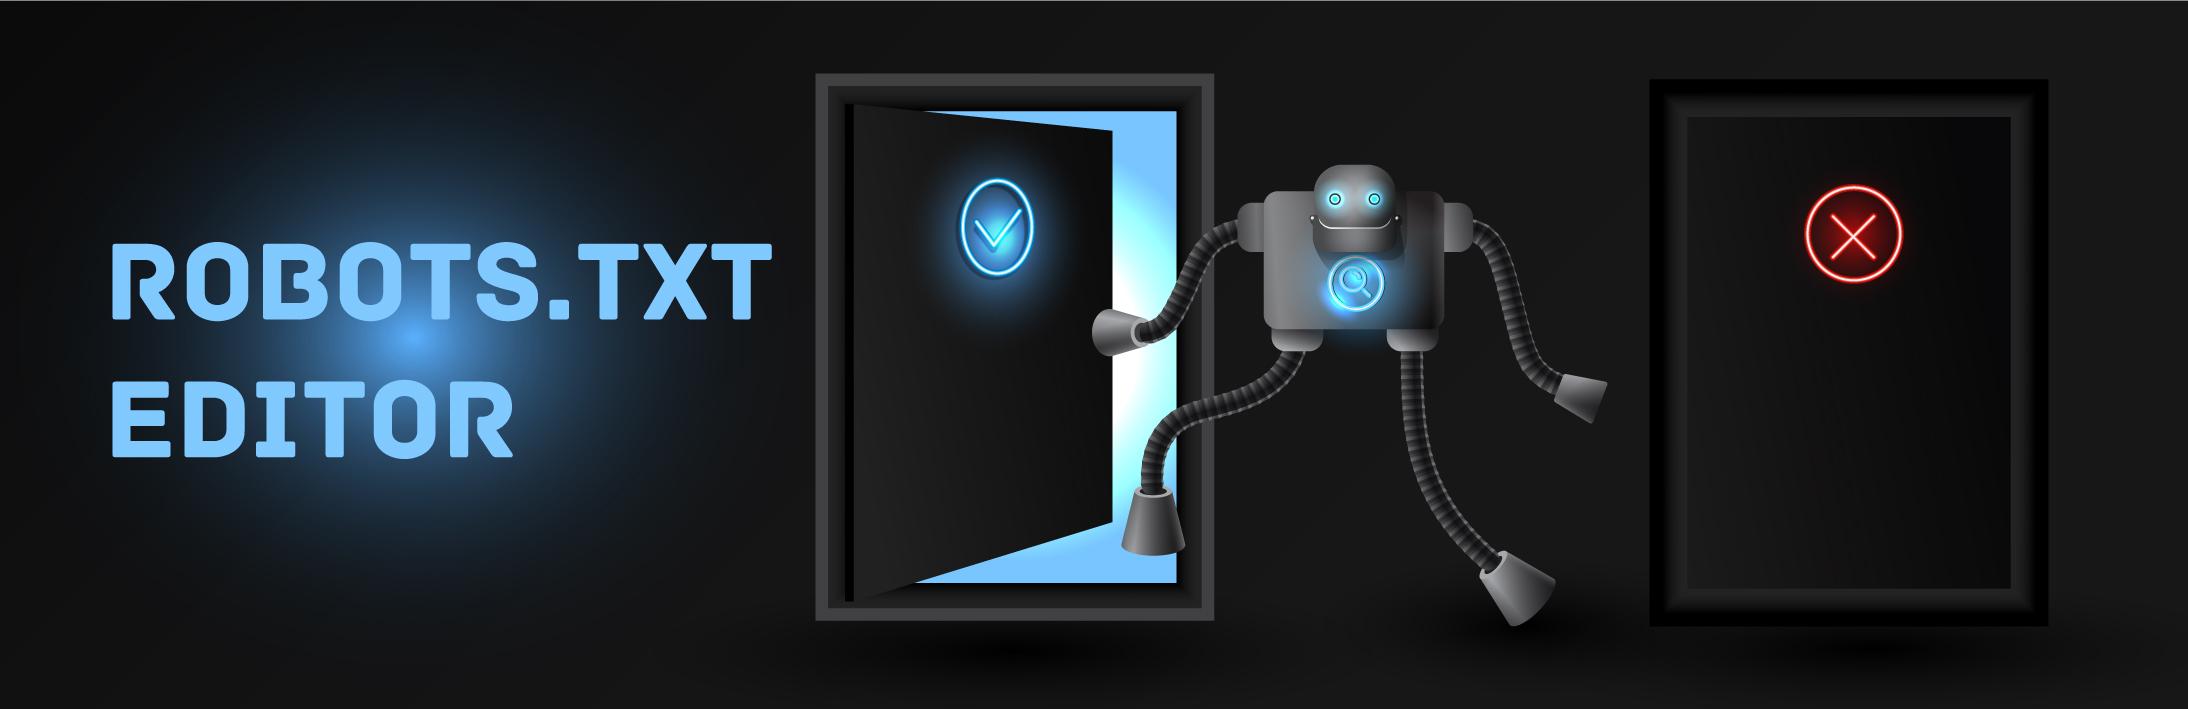 WordPress Robots.txt Editor Plugin Banner Image